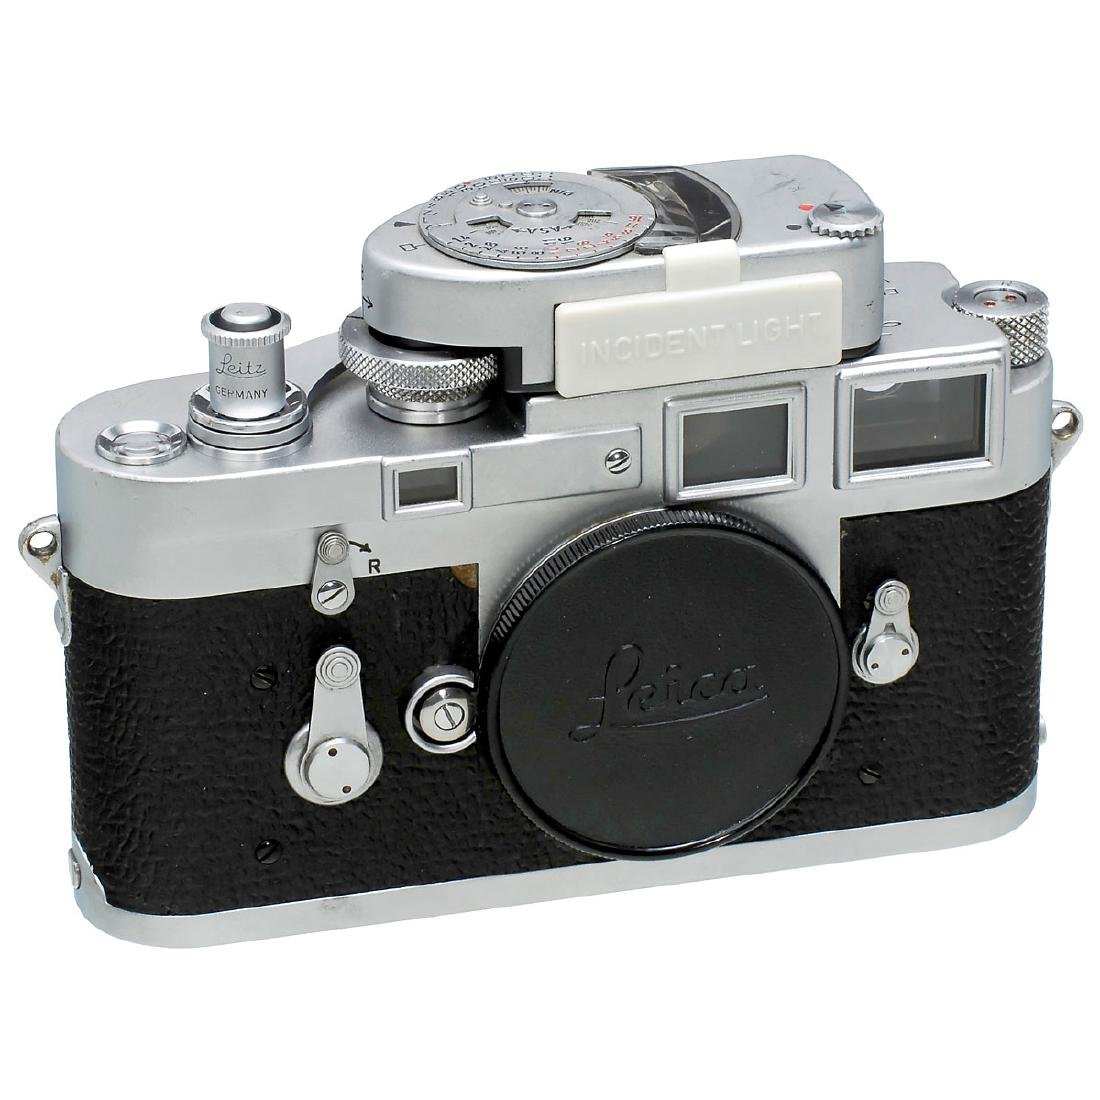 Leica M3 Body, 1955